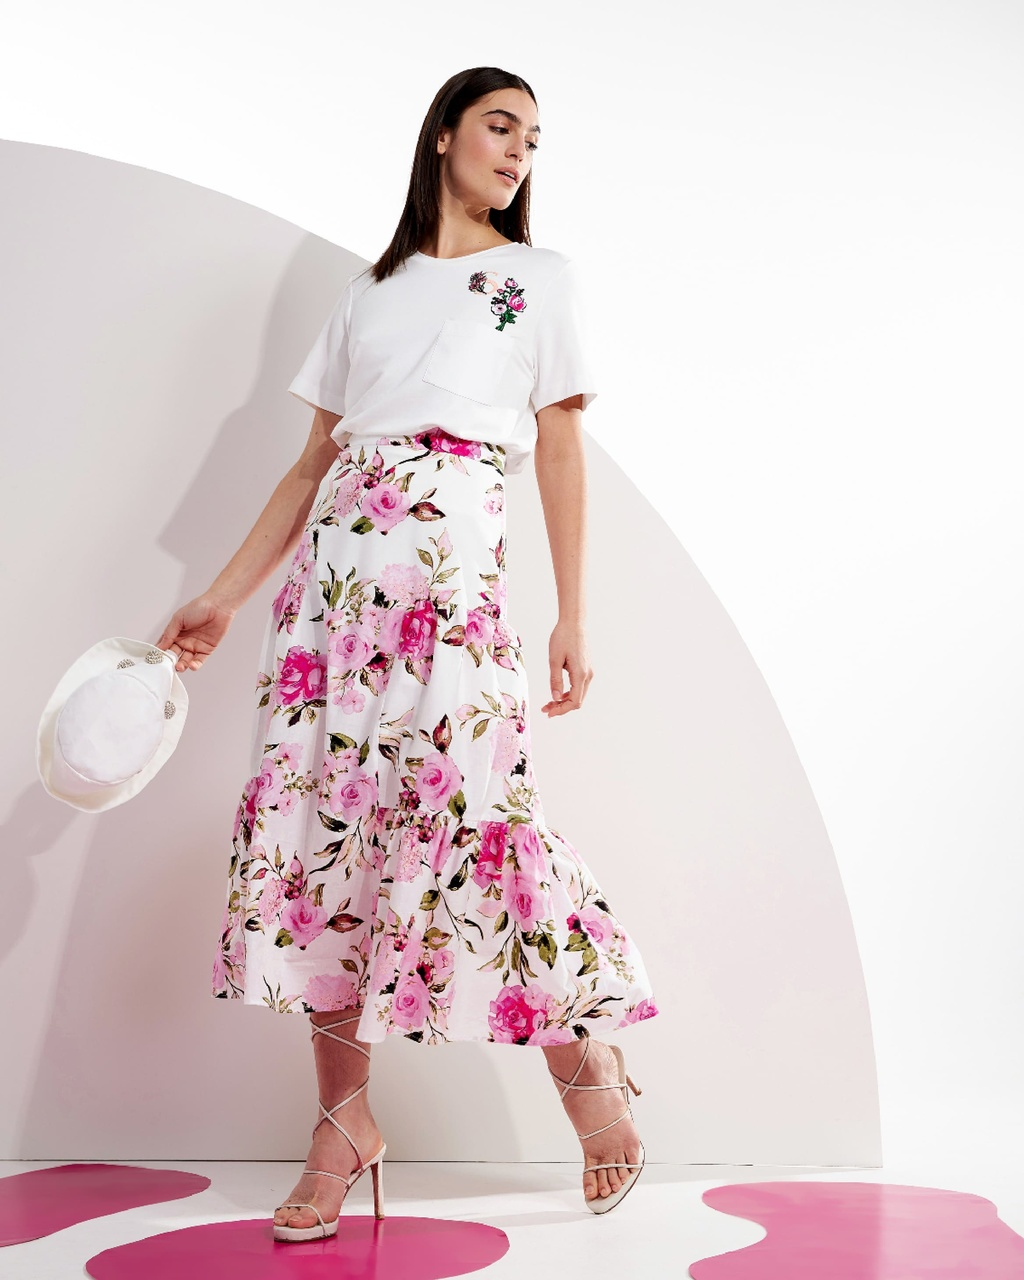 Saia Midi Floral com Recortes